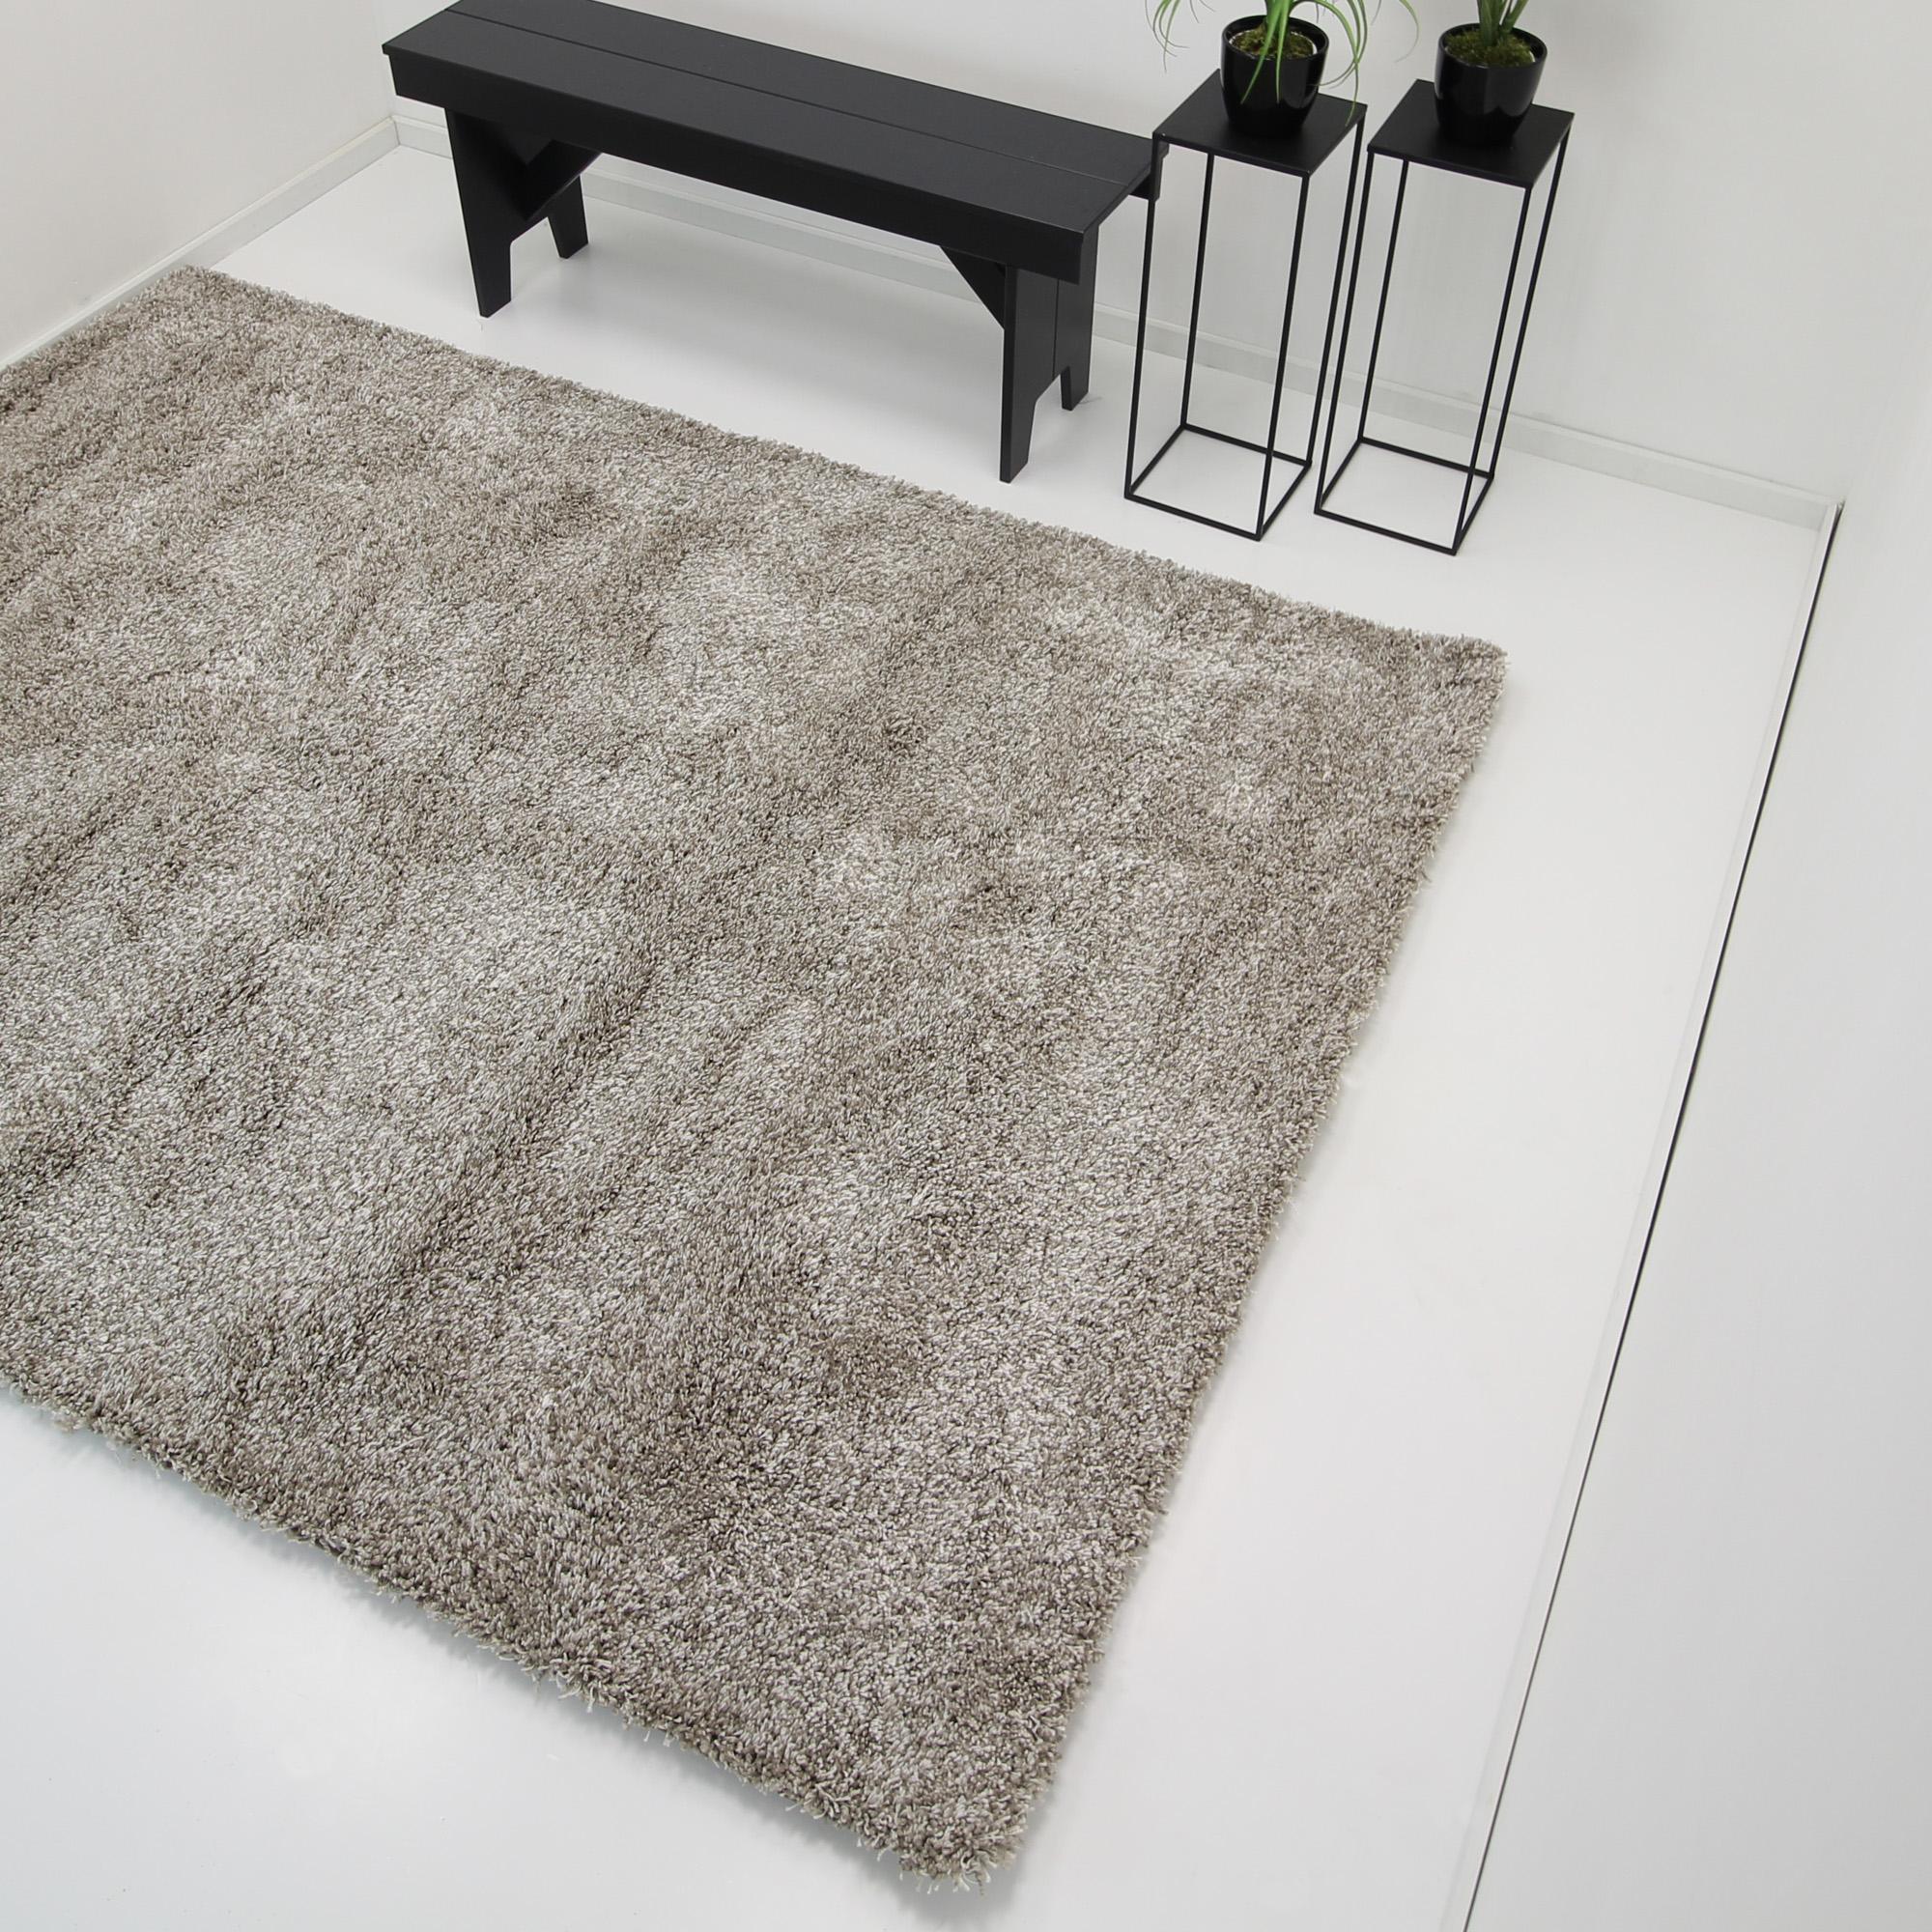 Vloerkleed San Francisco Silver Frost | 300 x 400 cm